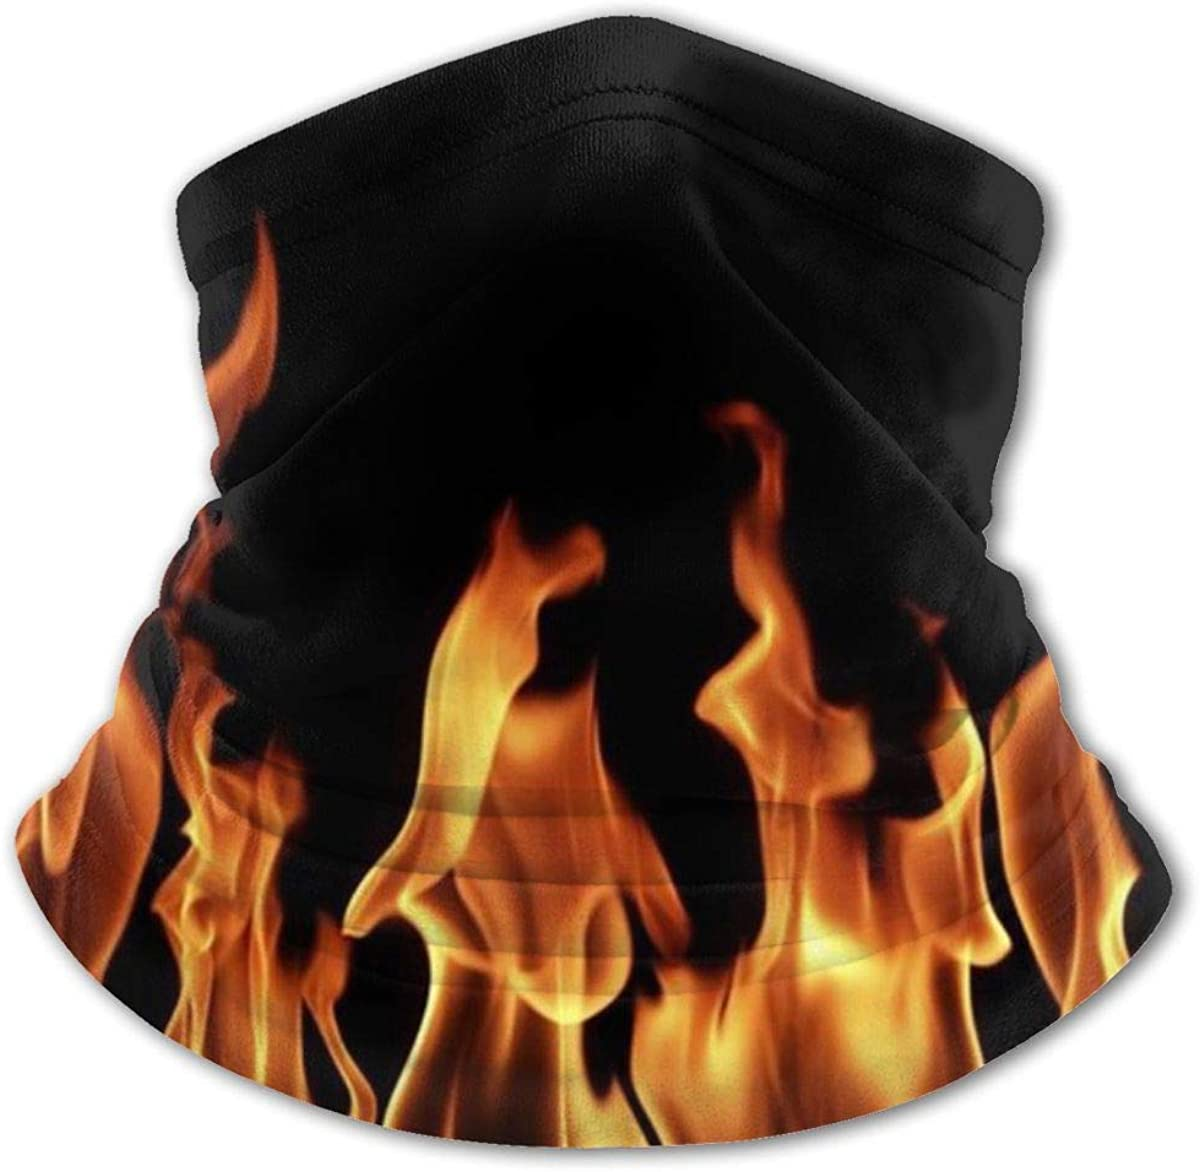 Burning Flame Print Headwear For Girls And Boys, Head Wrap, Neck Gaiter, Headband, Tenn Fishing Mask, Magic Scarf, Tube Mask, Face Bandana Mask For Camping Running Cycling